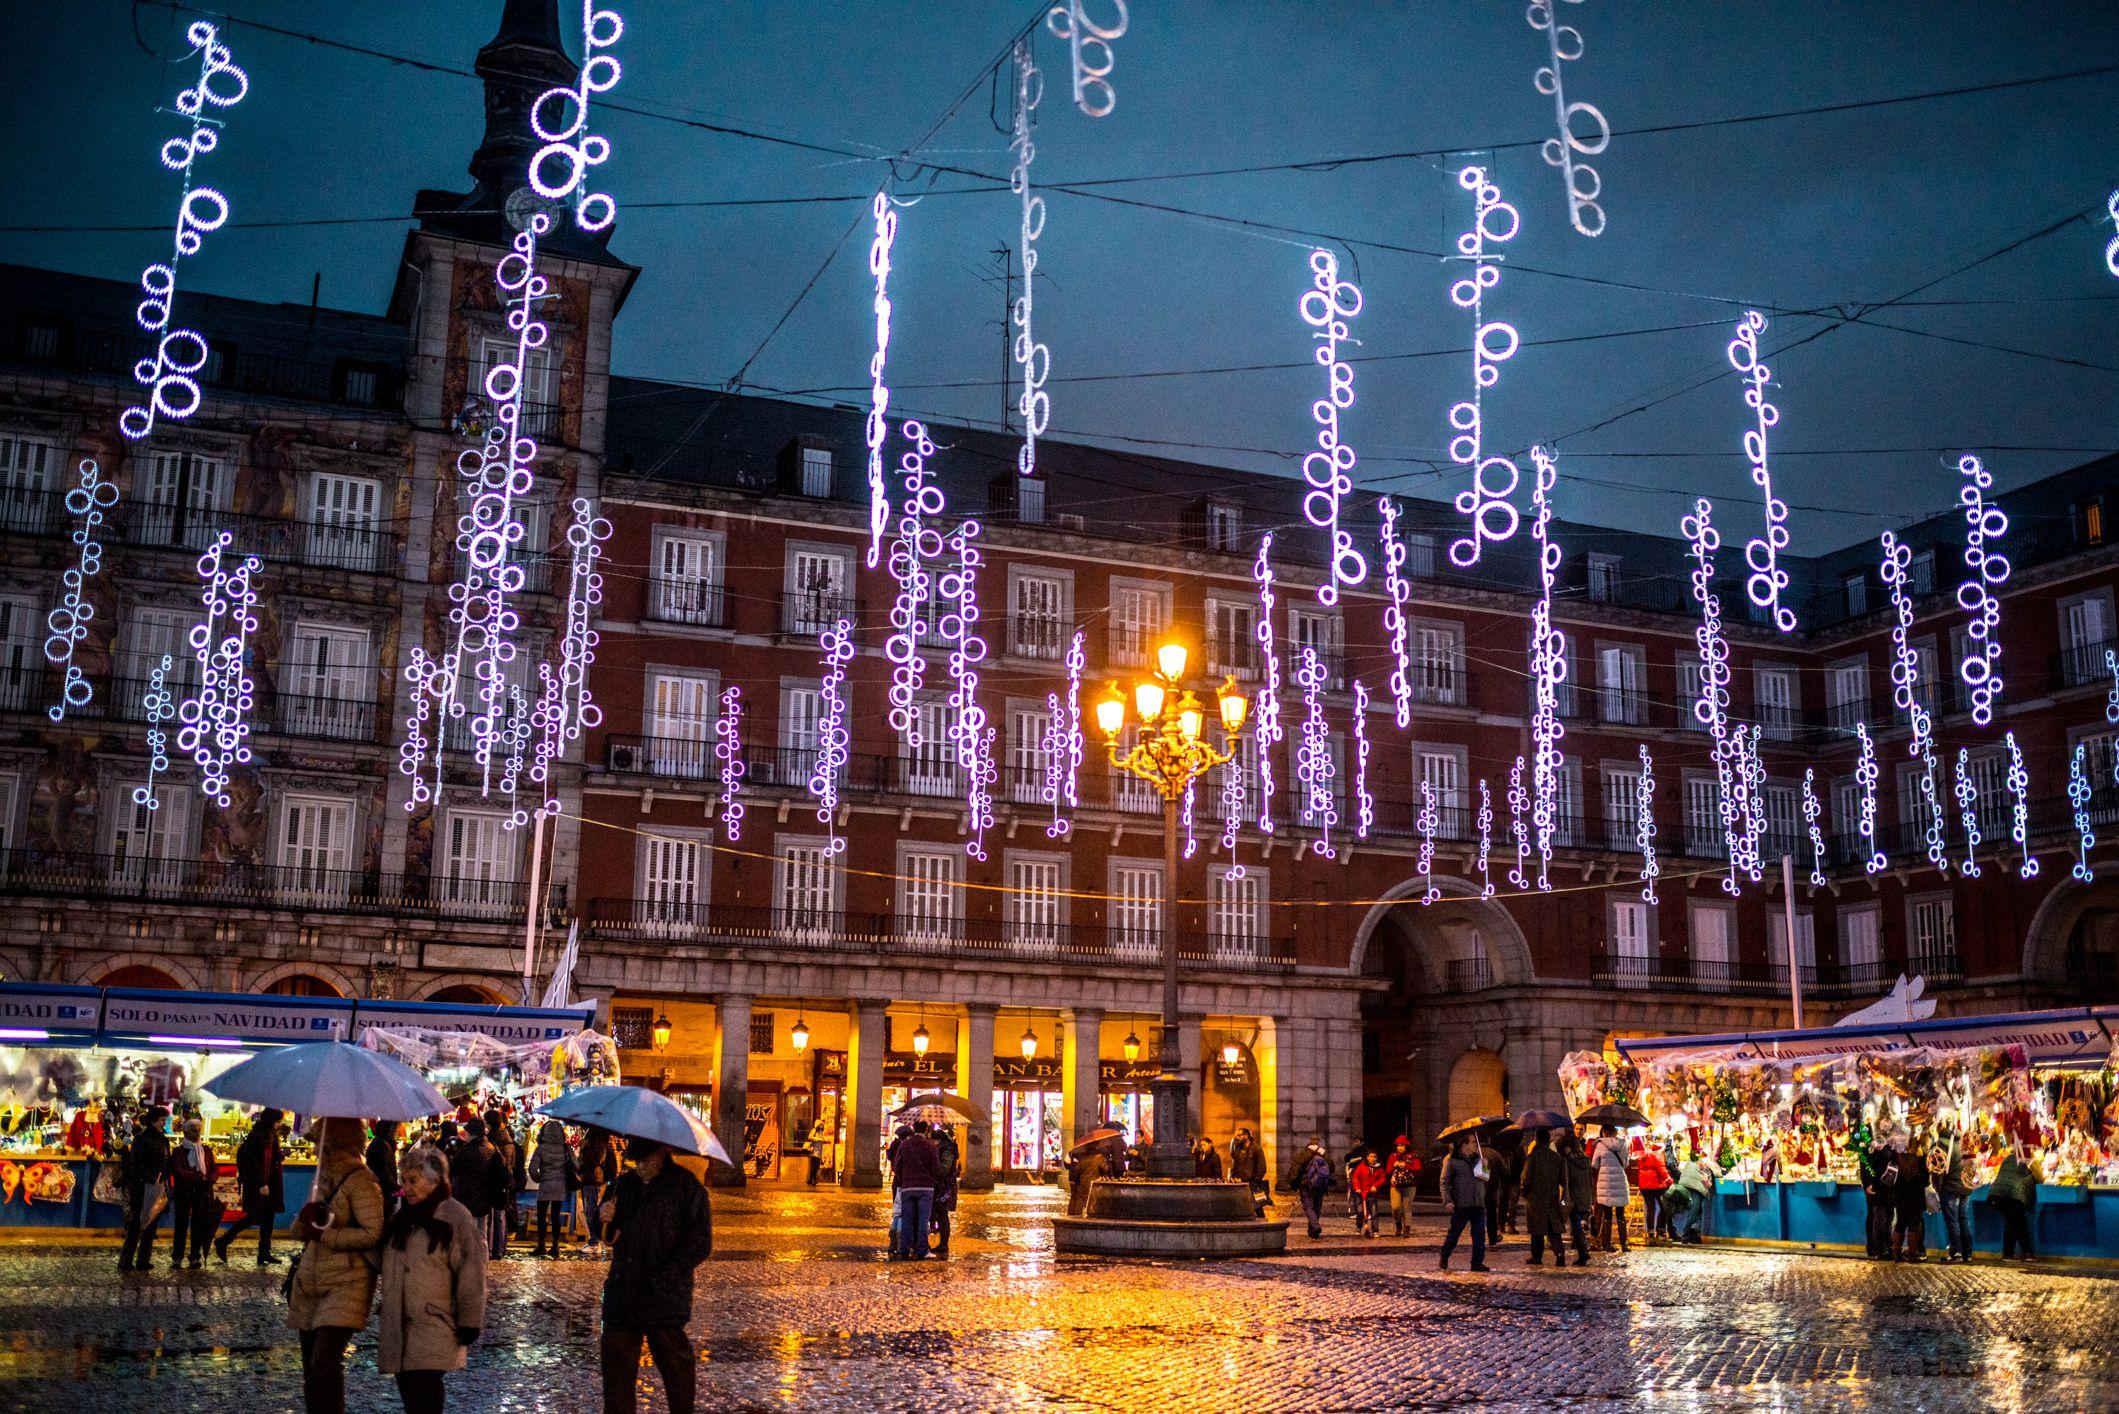 People buying gifts at the Plaza Mayor Christmas Market, Madrid